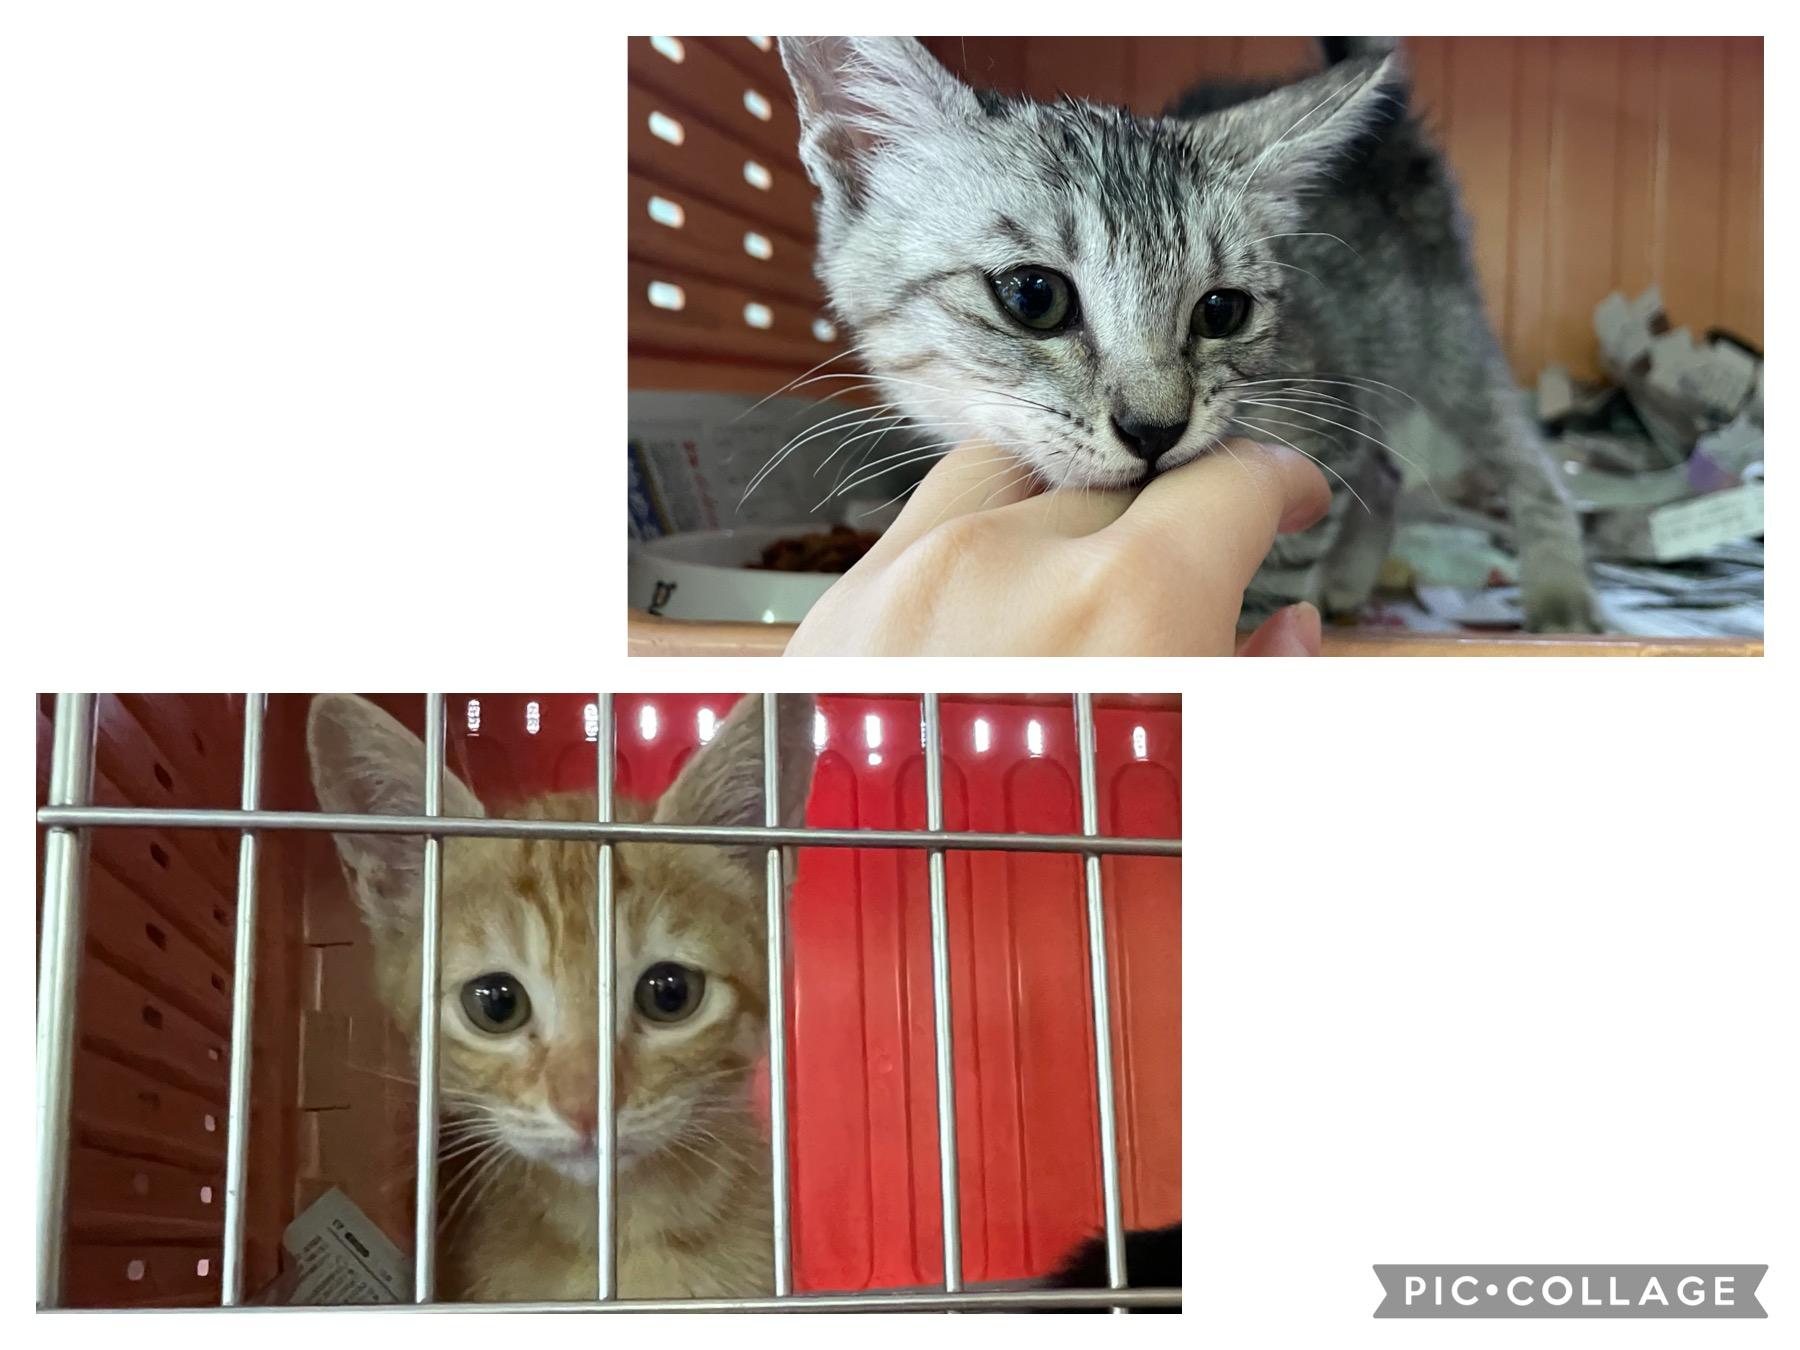 <p></p> <ul> <li>猫種:日本猫</li> <li>性別:男の子1匹 女の子1匹</li> <li>年齢:2021年4月中旬頃生まれ</li> <li>保護経緯:譲渡センターで里親を探して欲しいとの事で保護しました。</li> </ul>